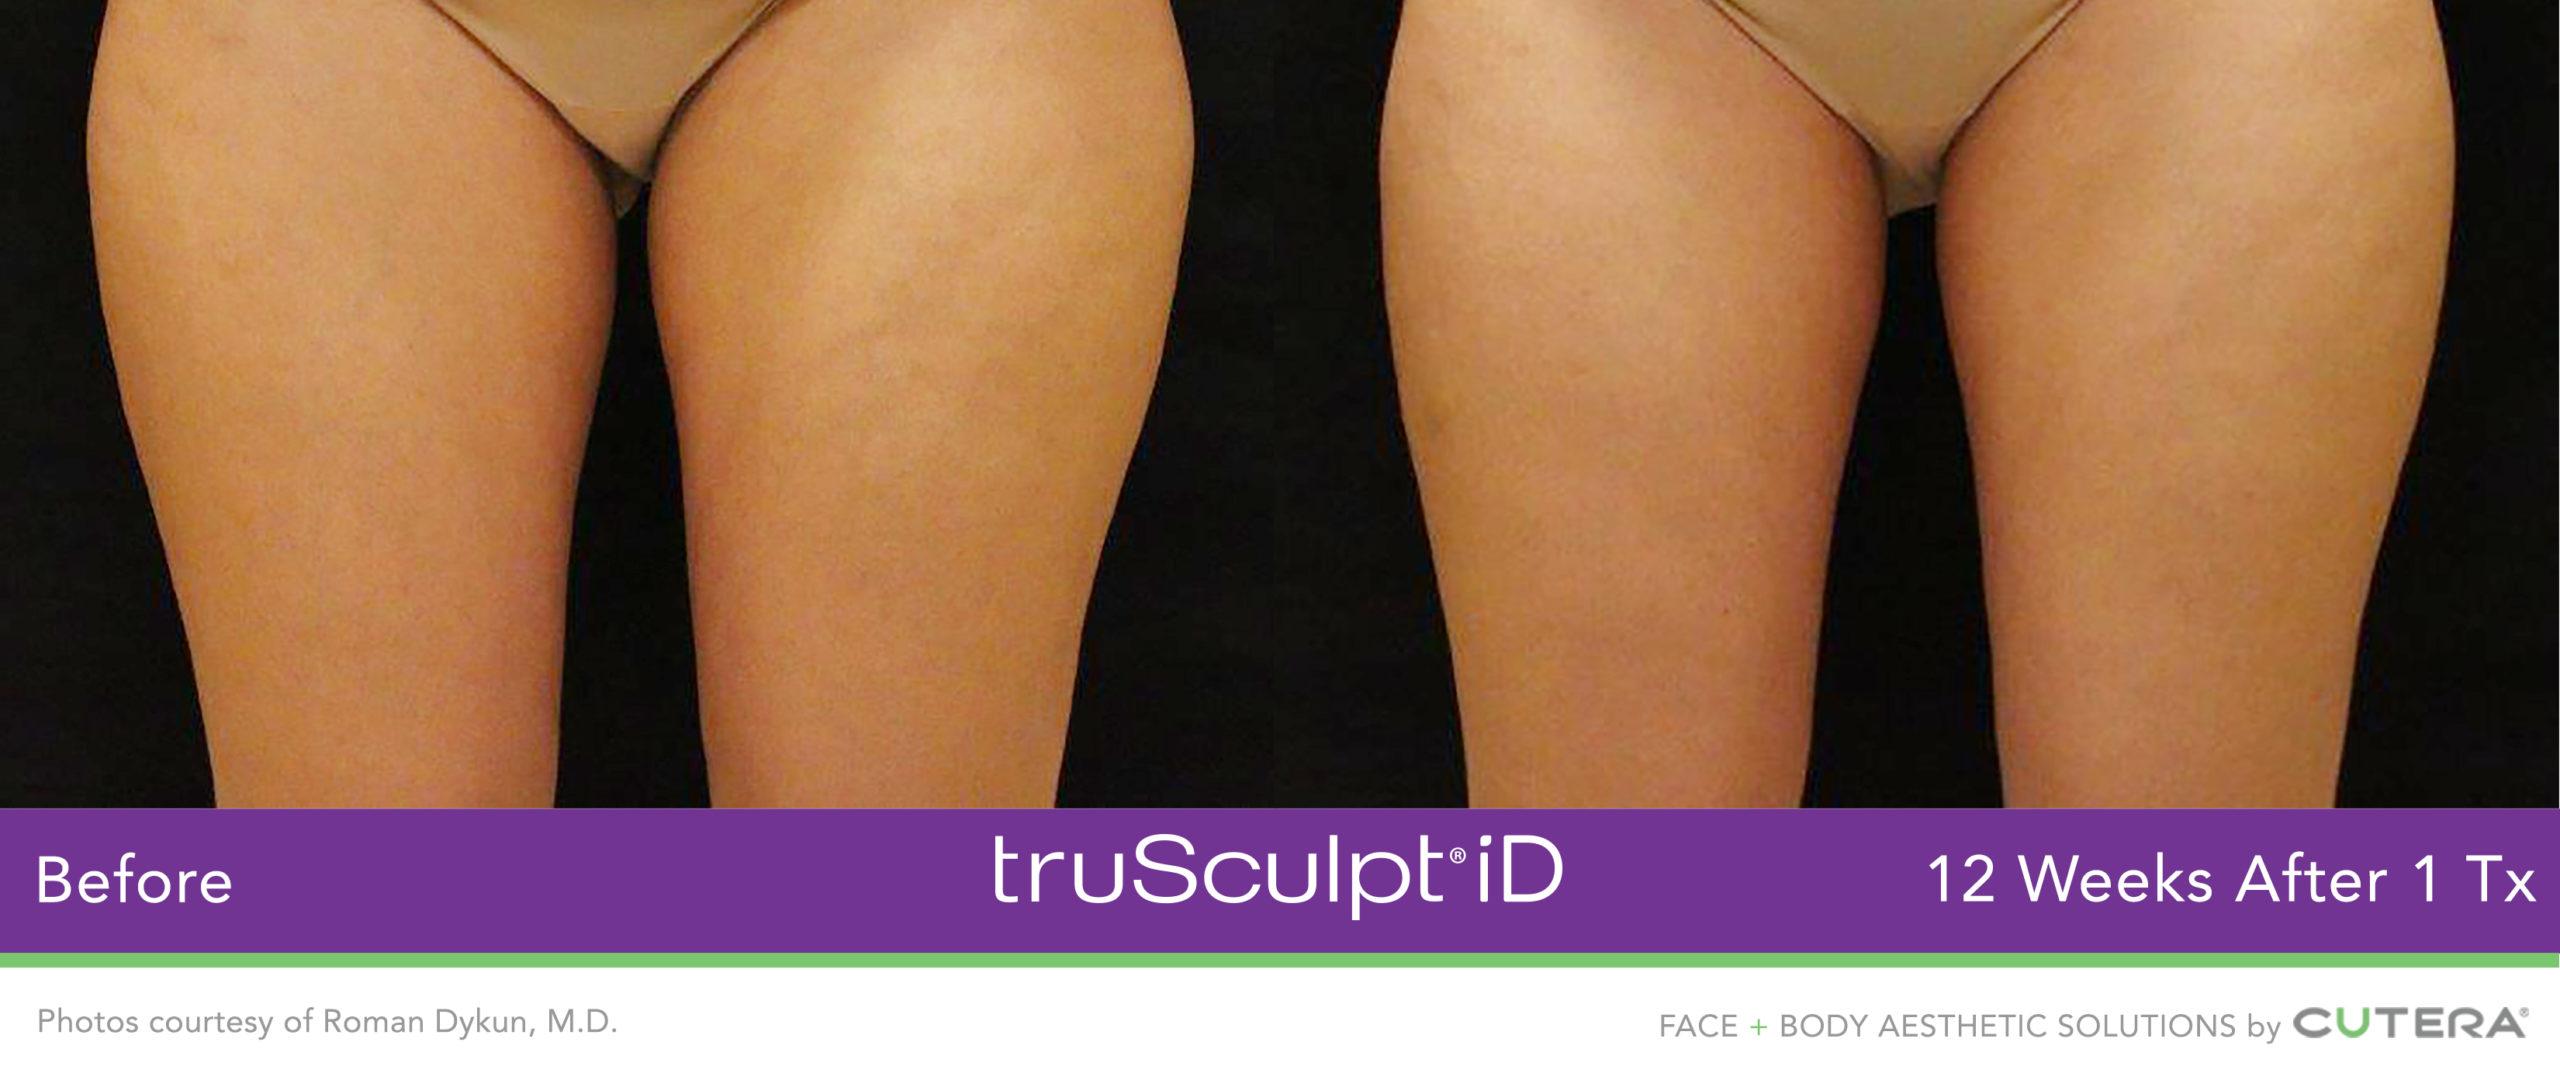 TruSculpt iD